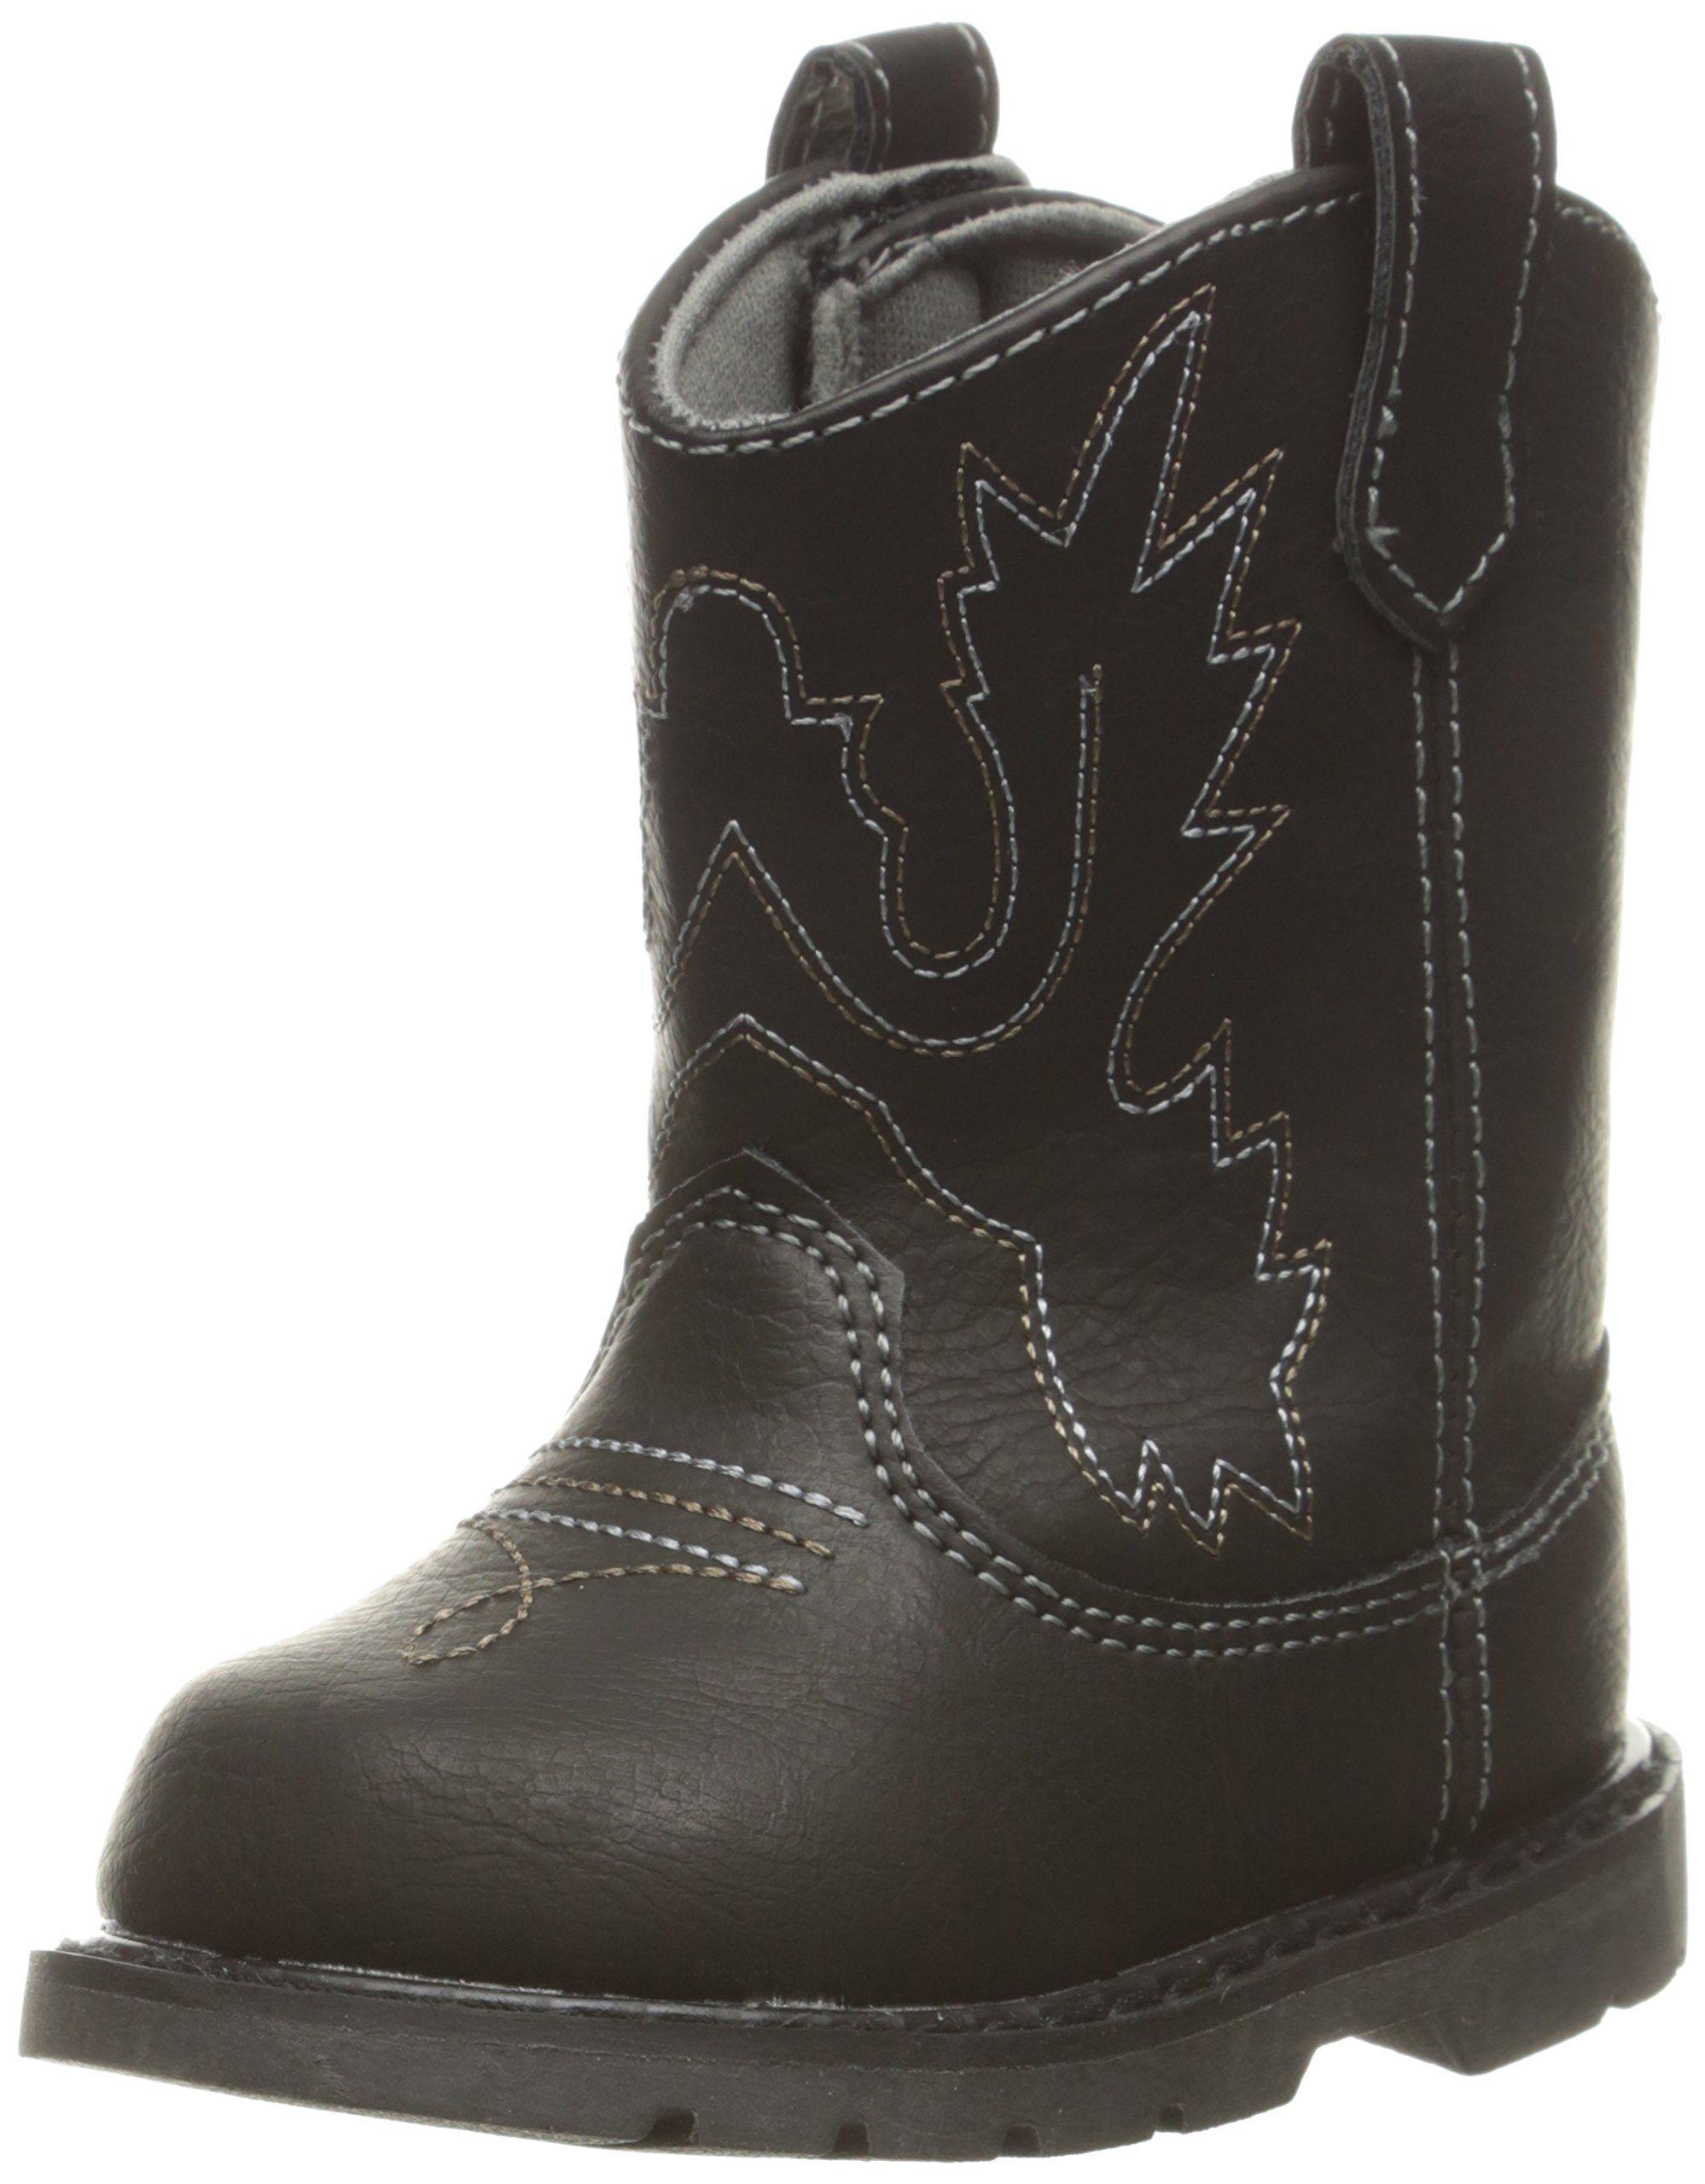 Baby Deer Kids Western Square Toe Boot Black 5 M US Toddler Pull